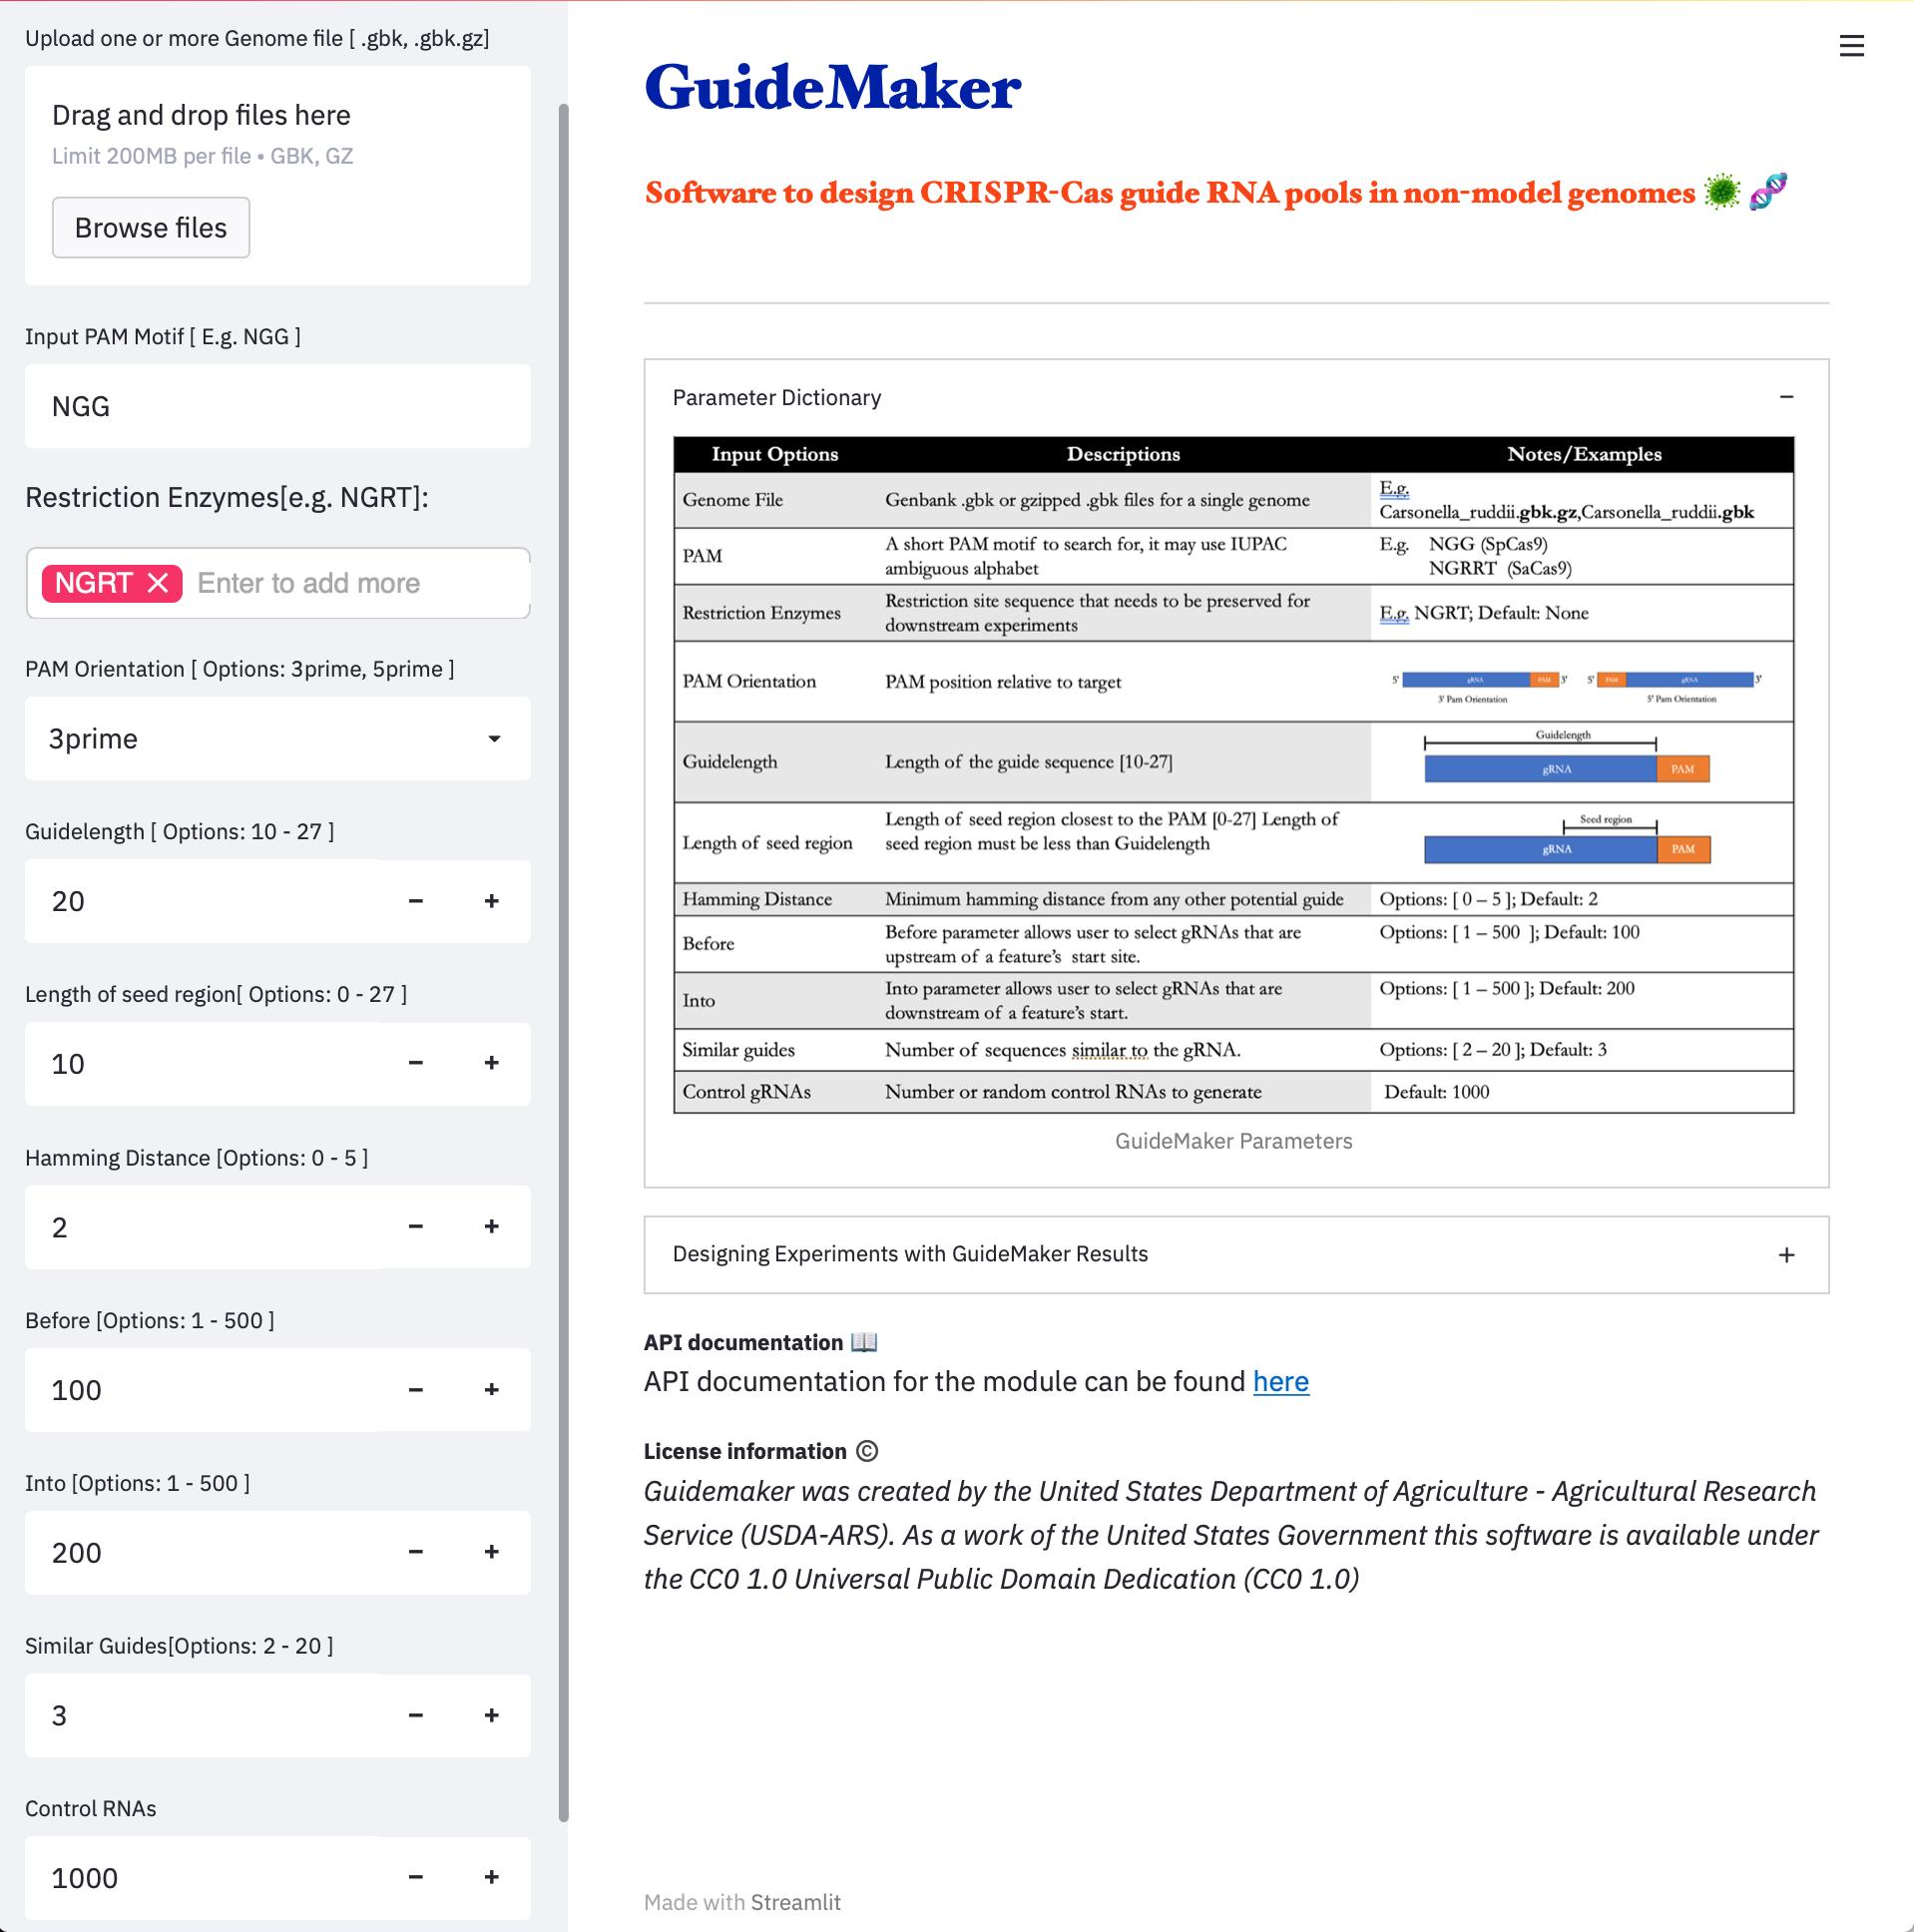 Image of GuideMaker Web App